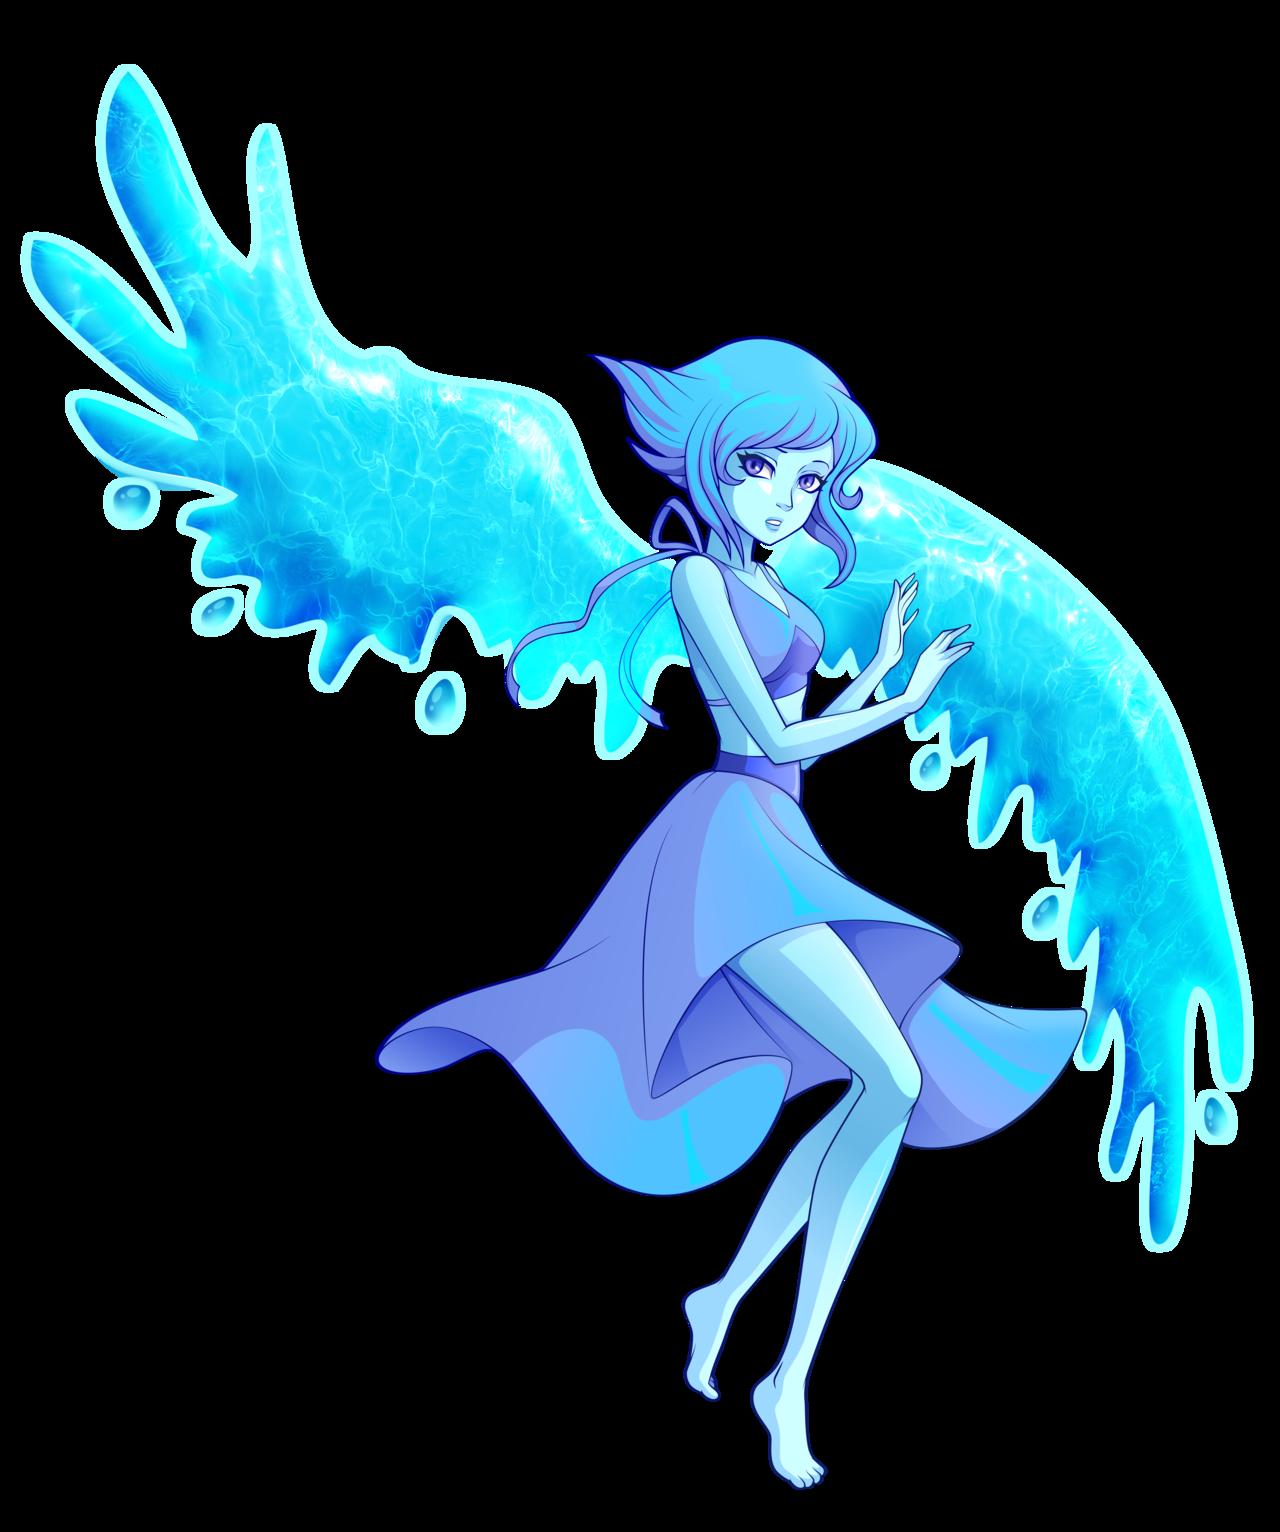 Lapis lazuli clipart #3